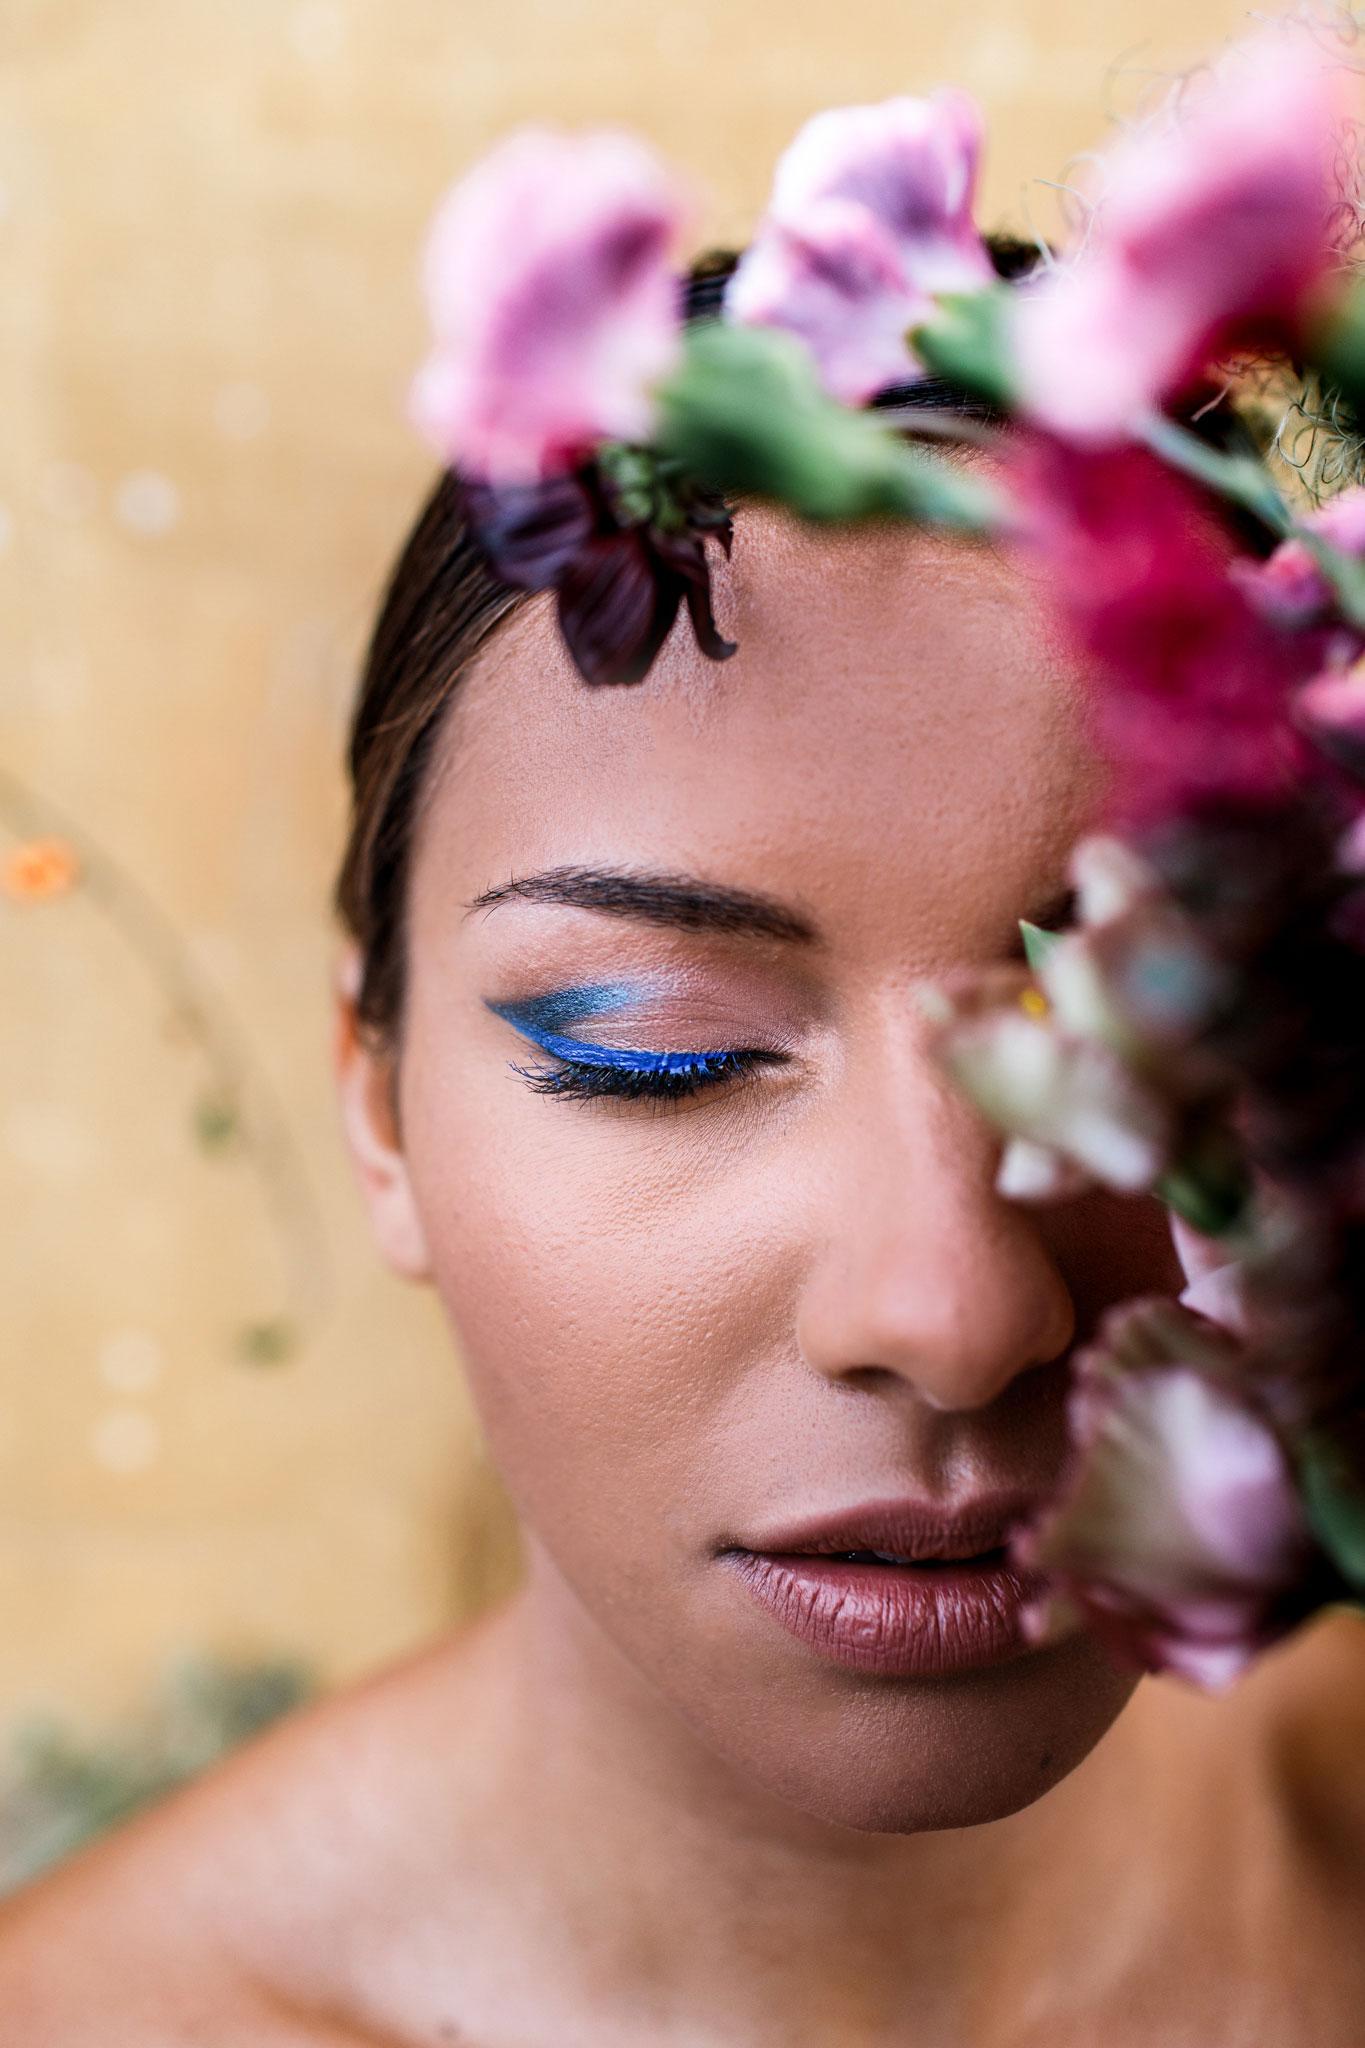 editorial fashion forward bride wearing electric blue eye makeup